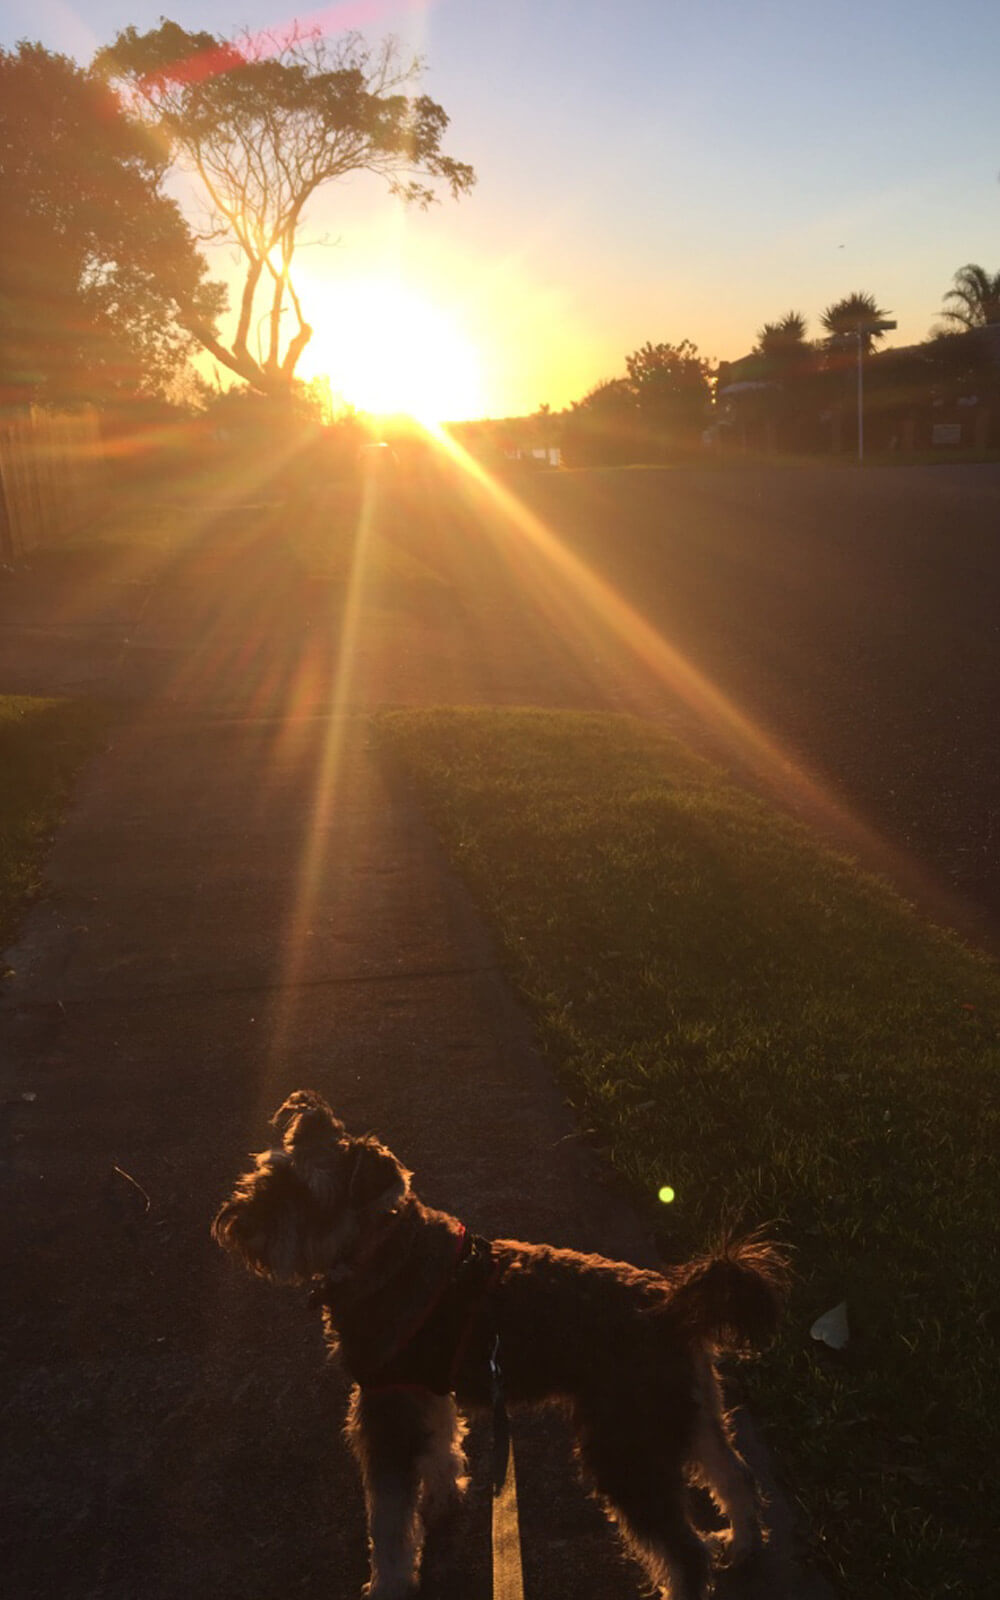 Spaziergang mit Rufus bei Sonnenuntergang